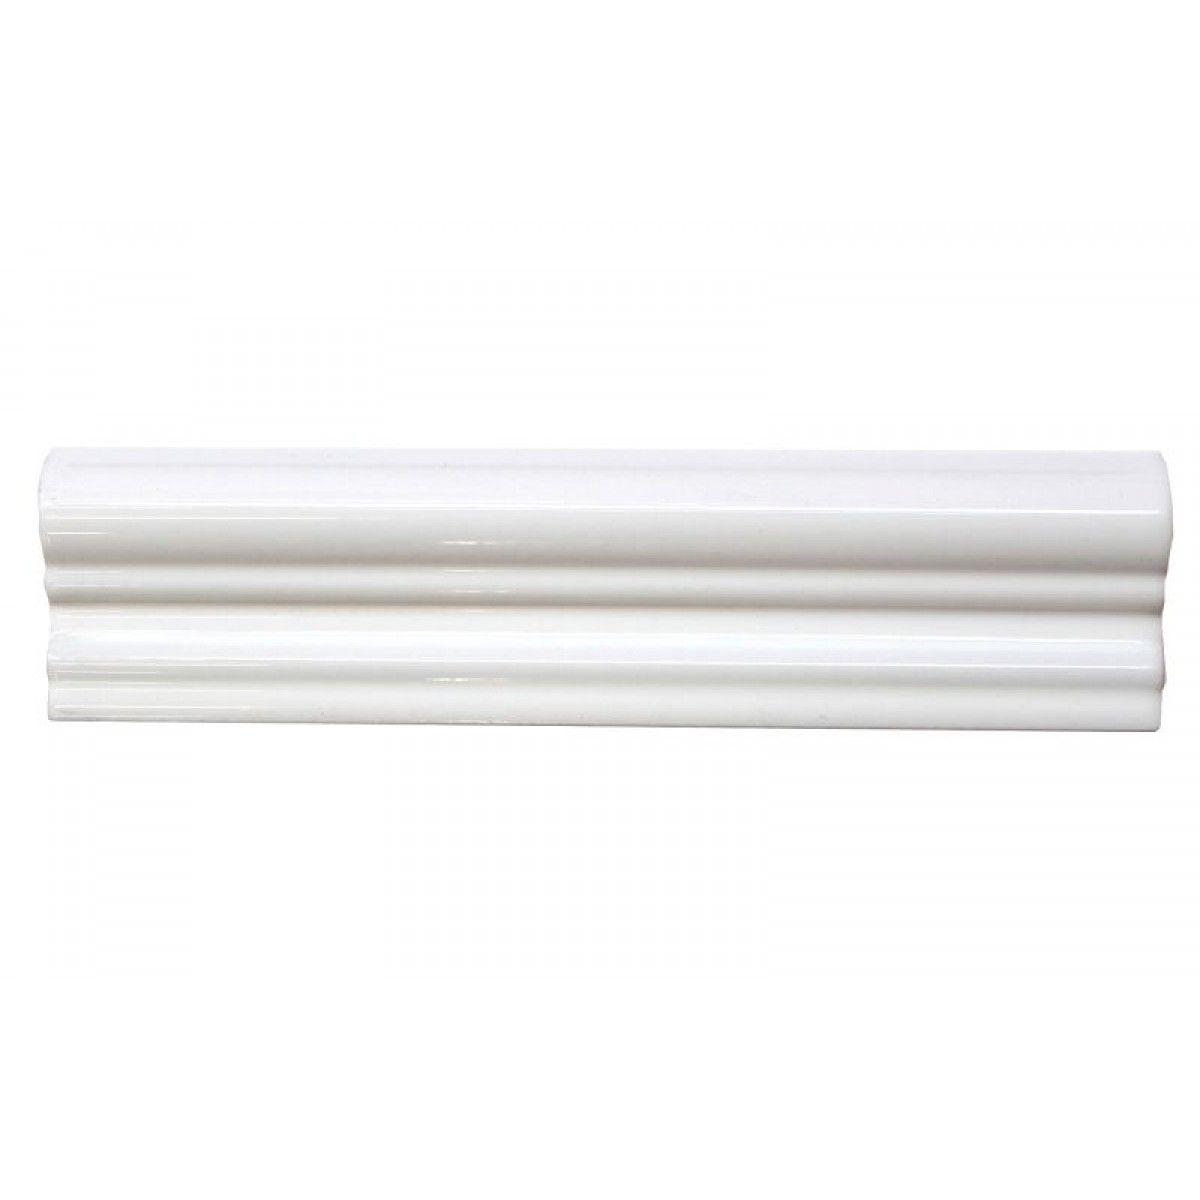 White dado 50mm x 200mm flats pinterest bathroom tiling bathroom tiling doublecrazyfo Gallery